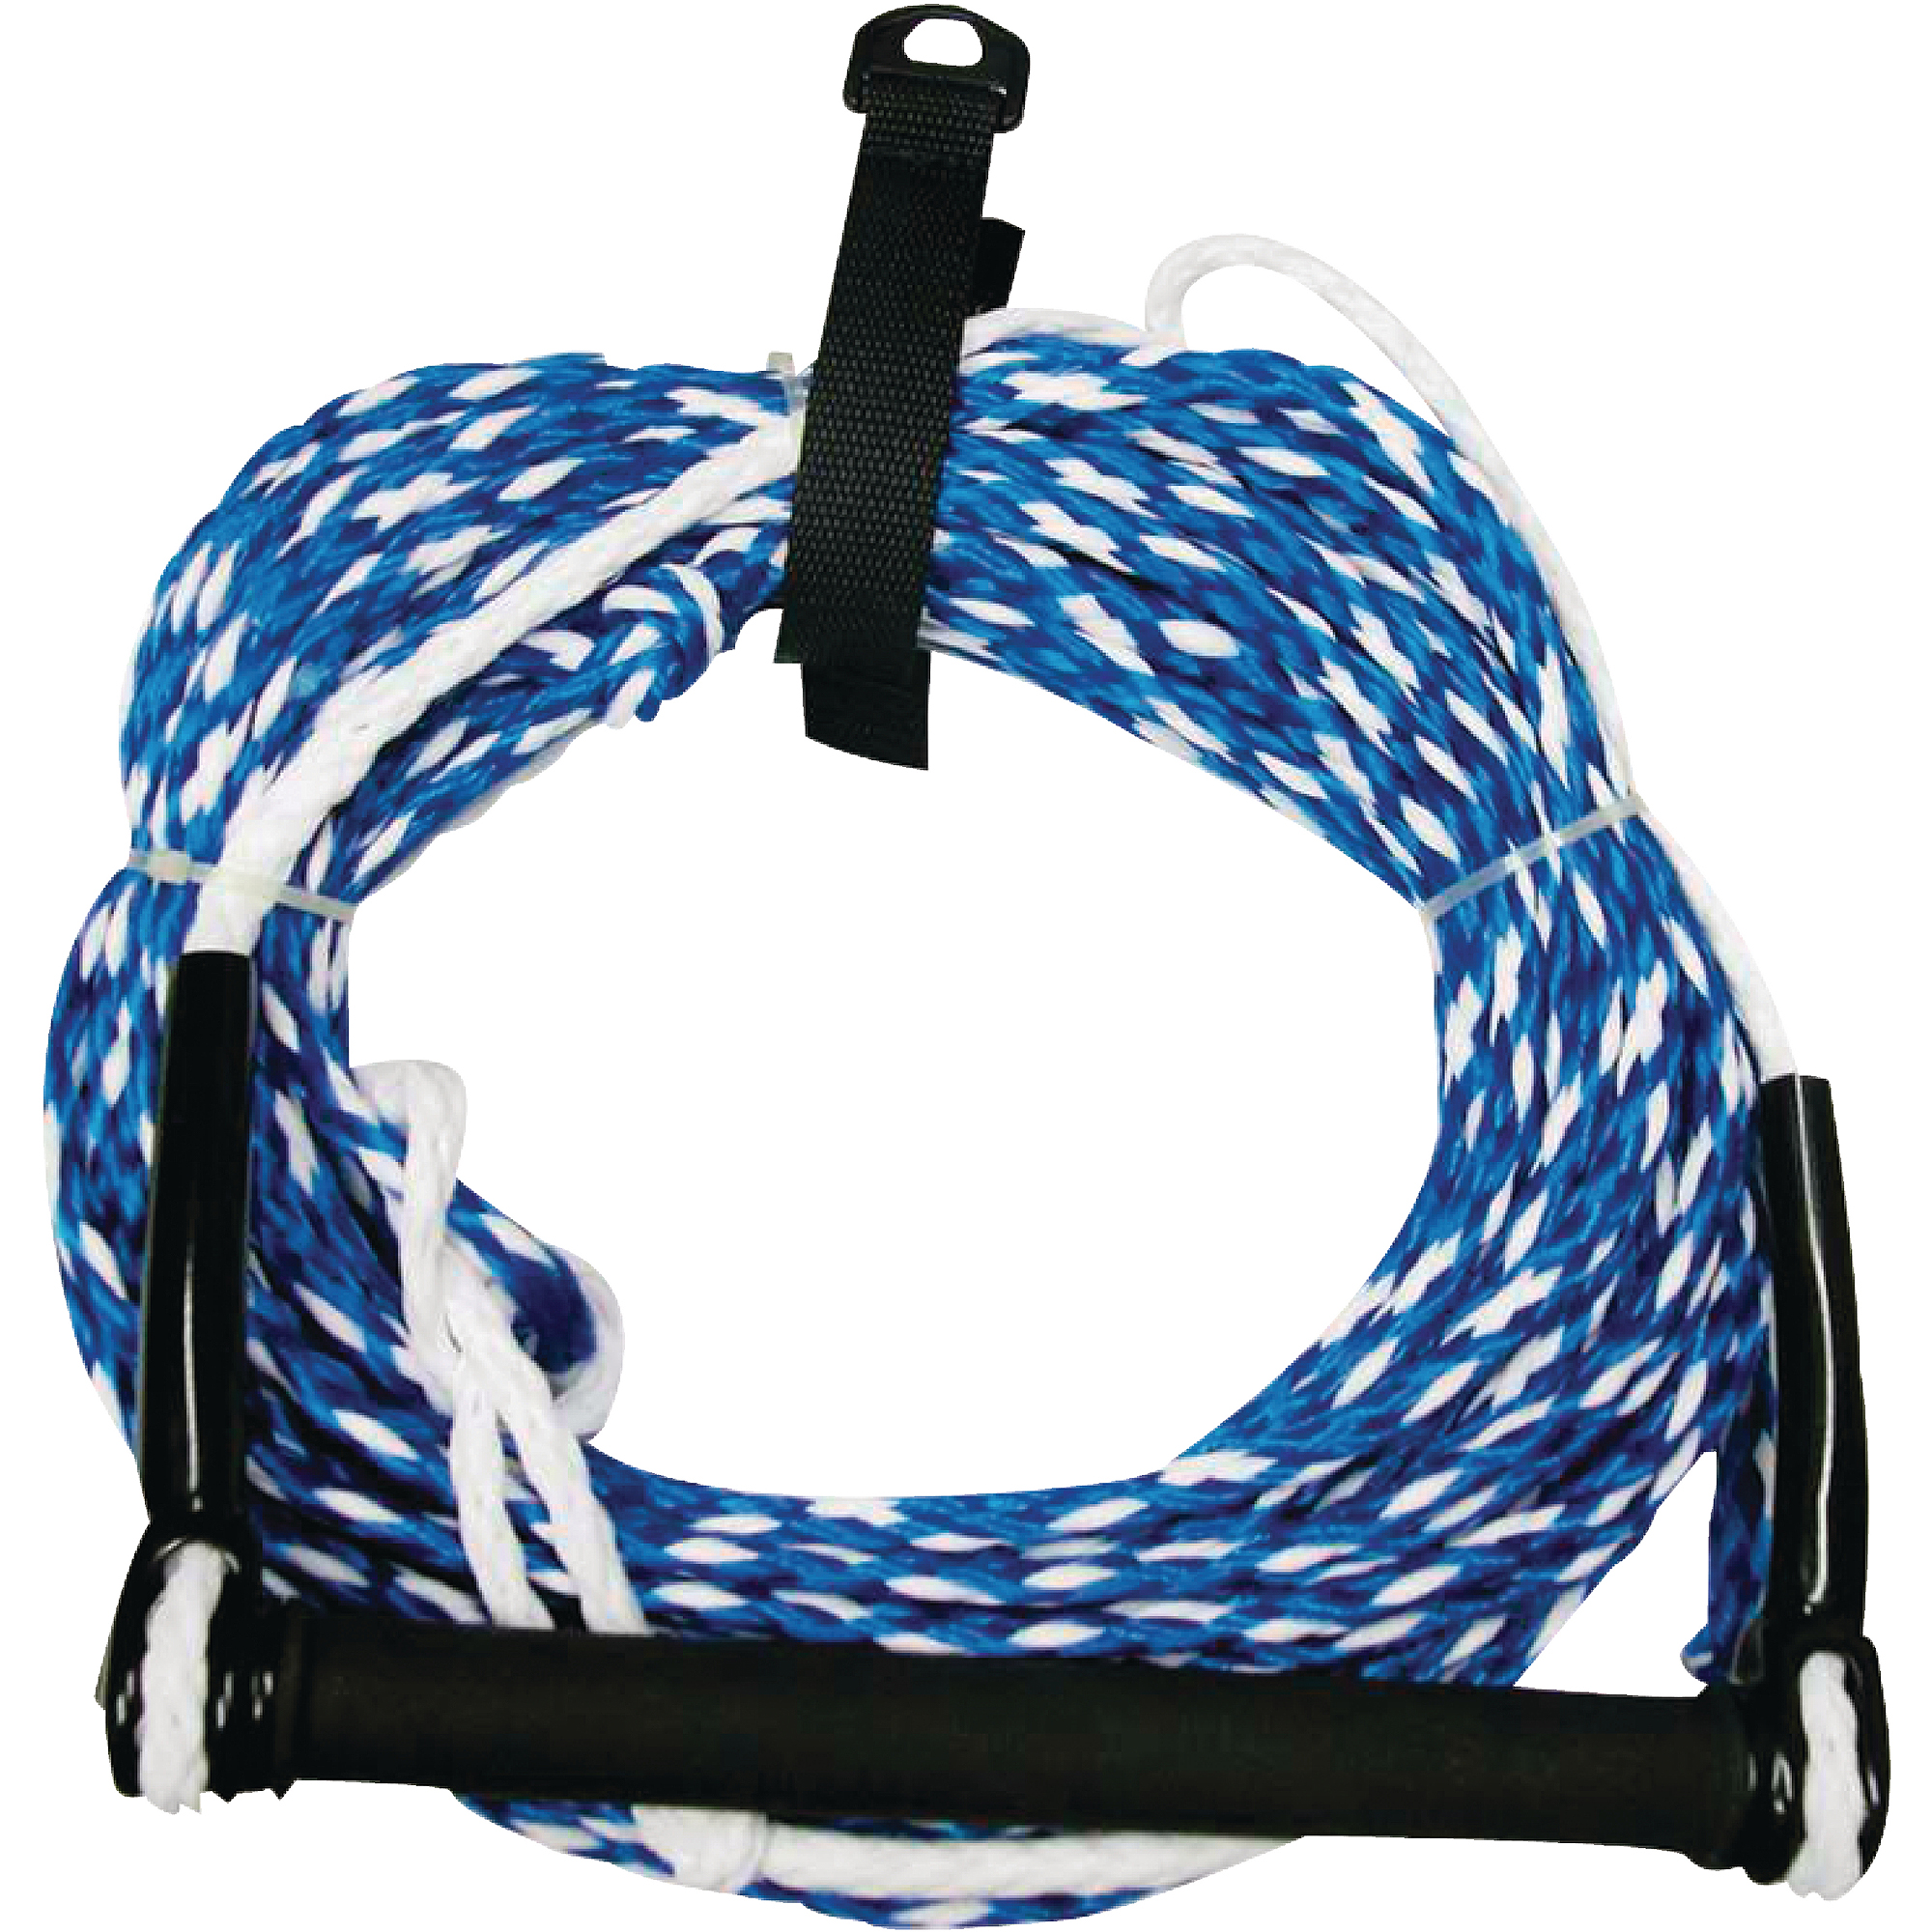 Seachoice Competition Ski Tow Rope, 75'